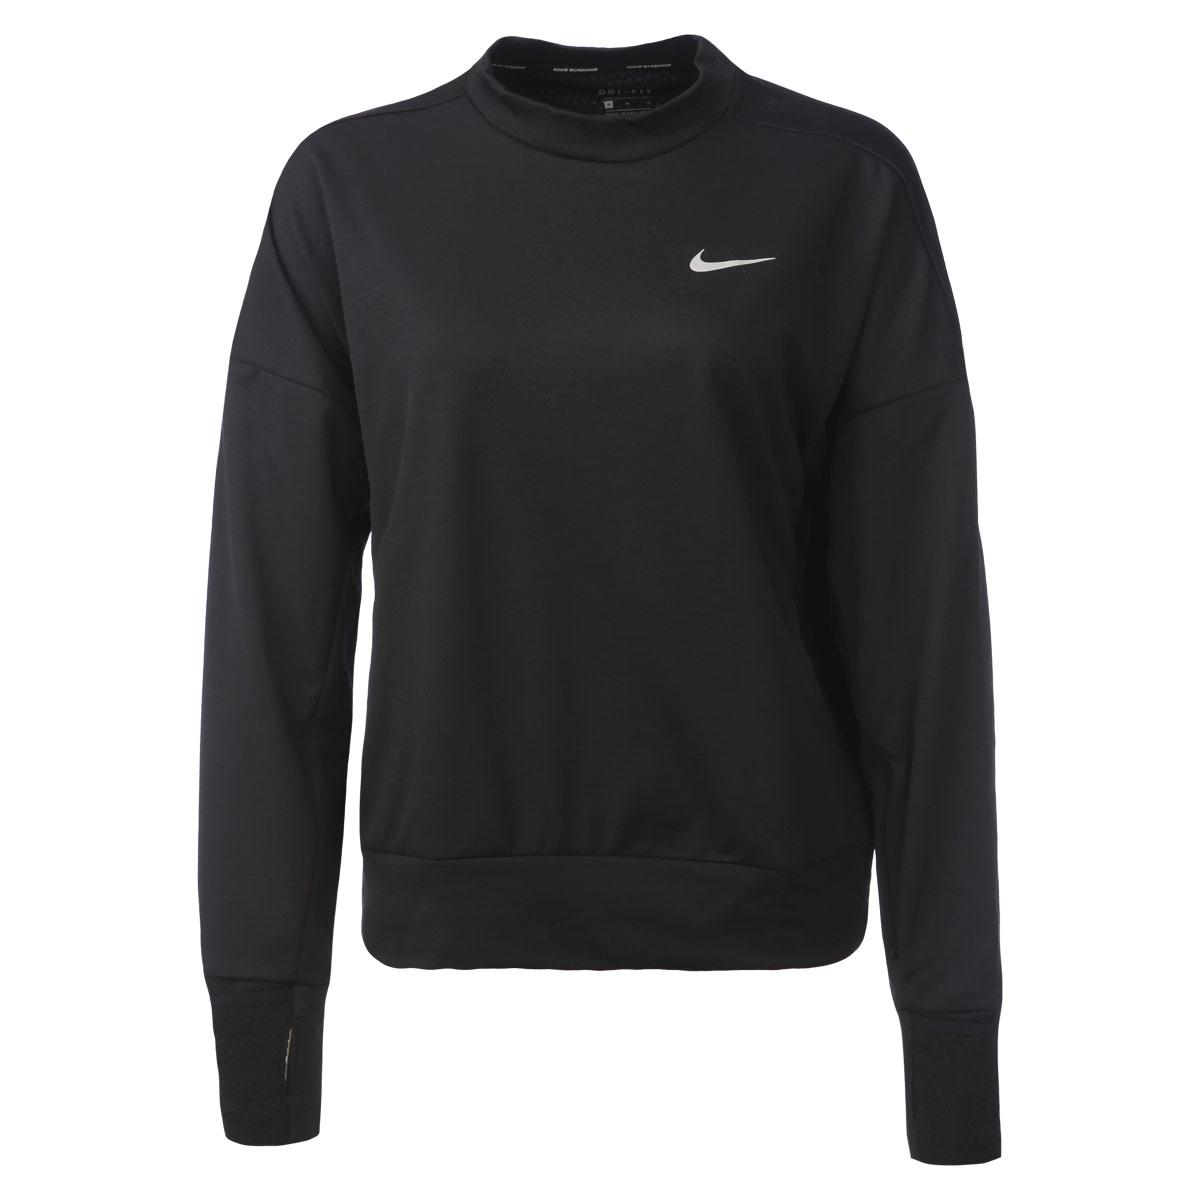 f940ab9bdb58 Nike Therma Sphere Element Top Crew 2.0 - Sweatshirts   Hoodies for Women -  Black